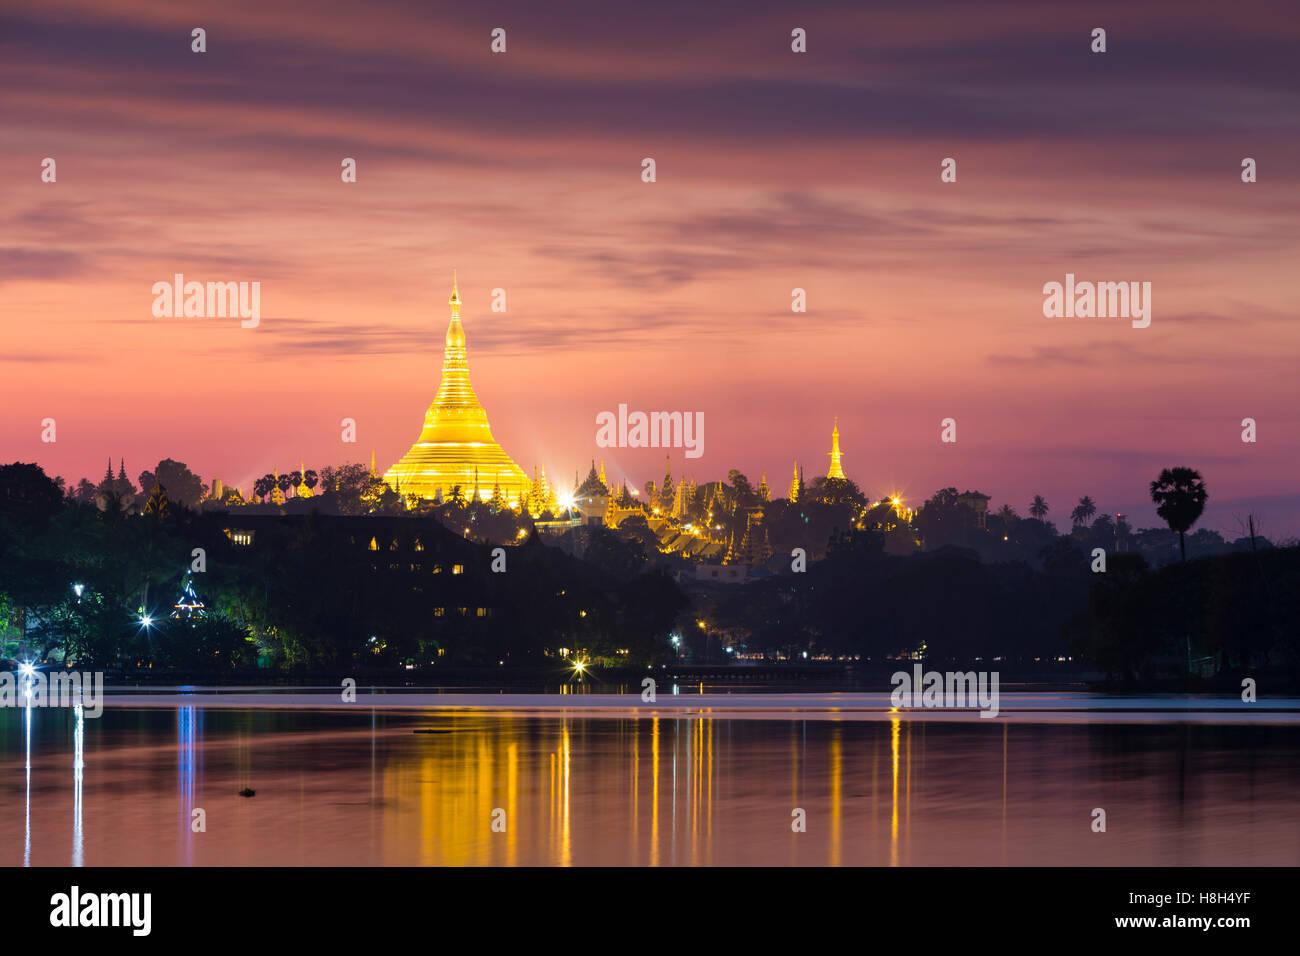 Shwedagon pagoda at sunset, as seen from Kandawgyi lake, Yangon, Myanmar - Stock Image